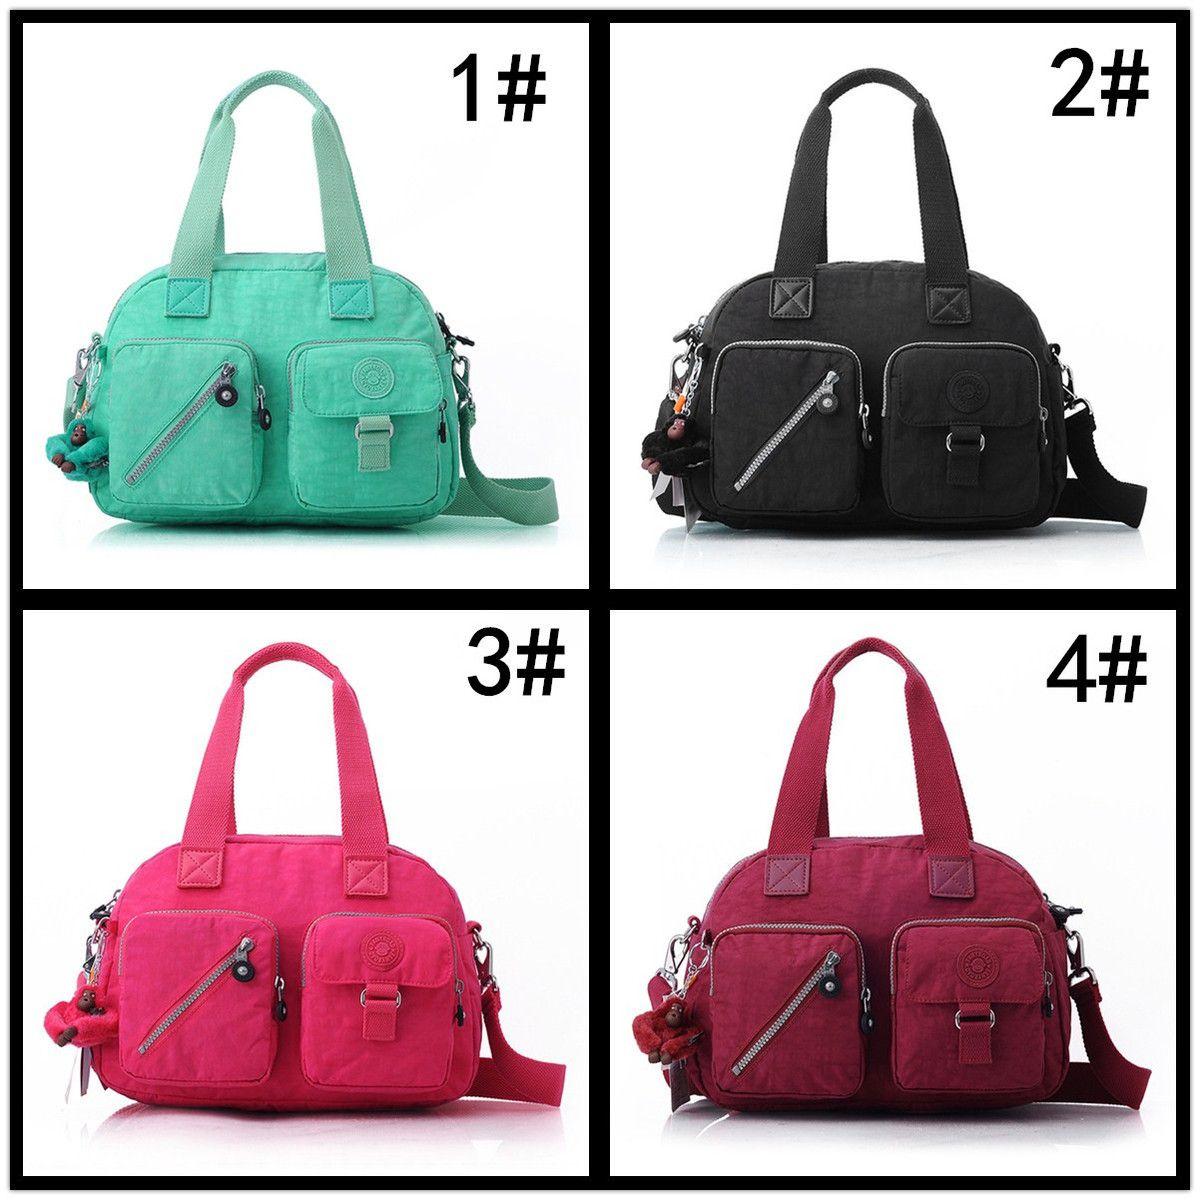 e1f5acd49fdd0 Großhandel Frauen Messenger Bags Shopping Reise Handtaschen Nylon Damen  Schultertasche Frauen Handtasche Casual Bag Von Cjf723